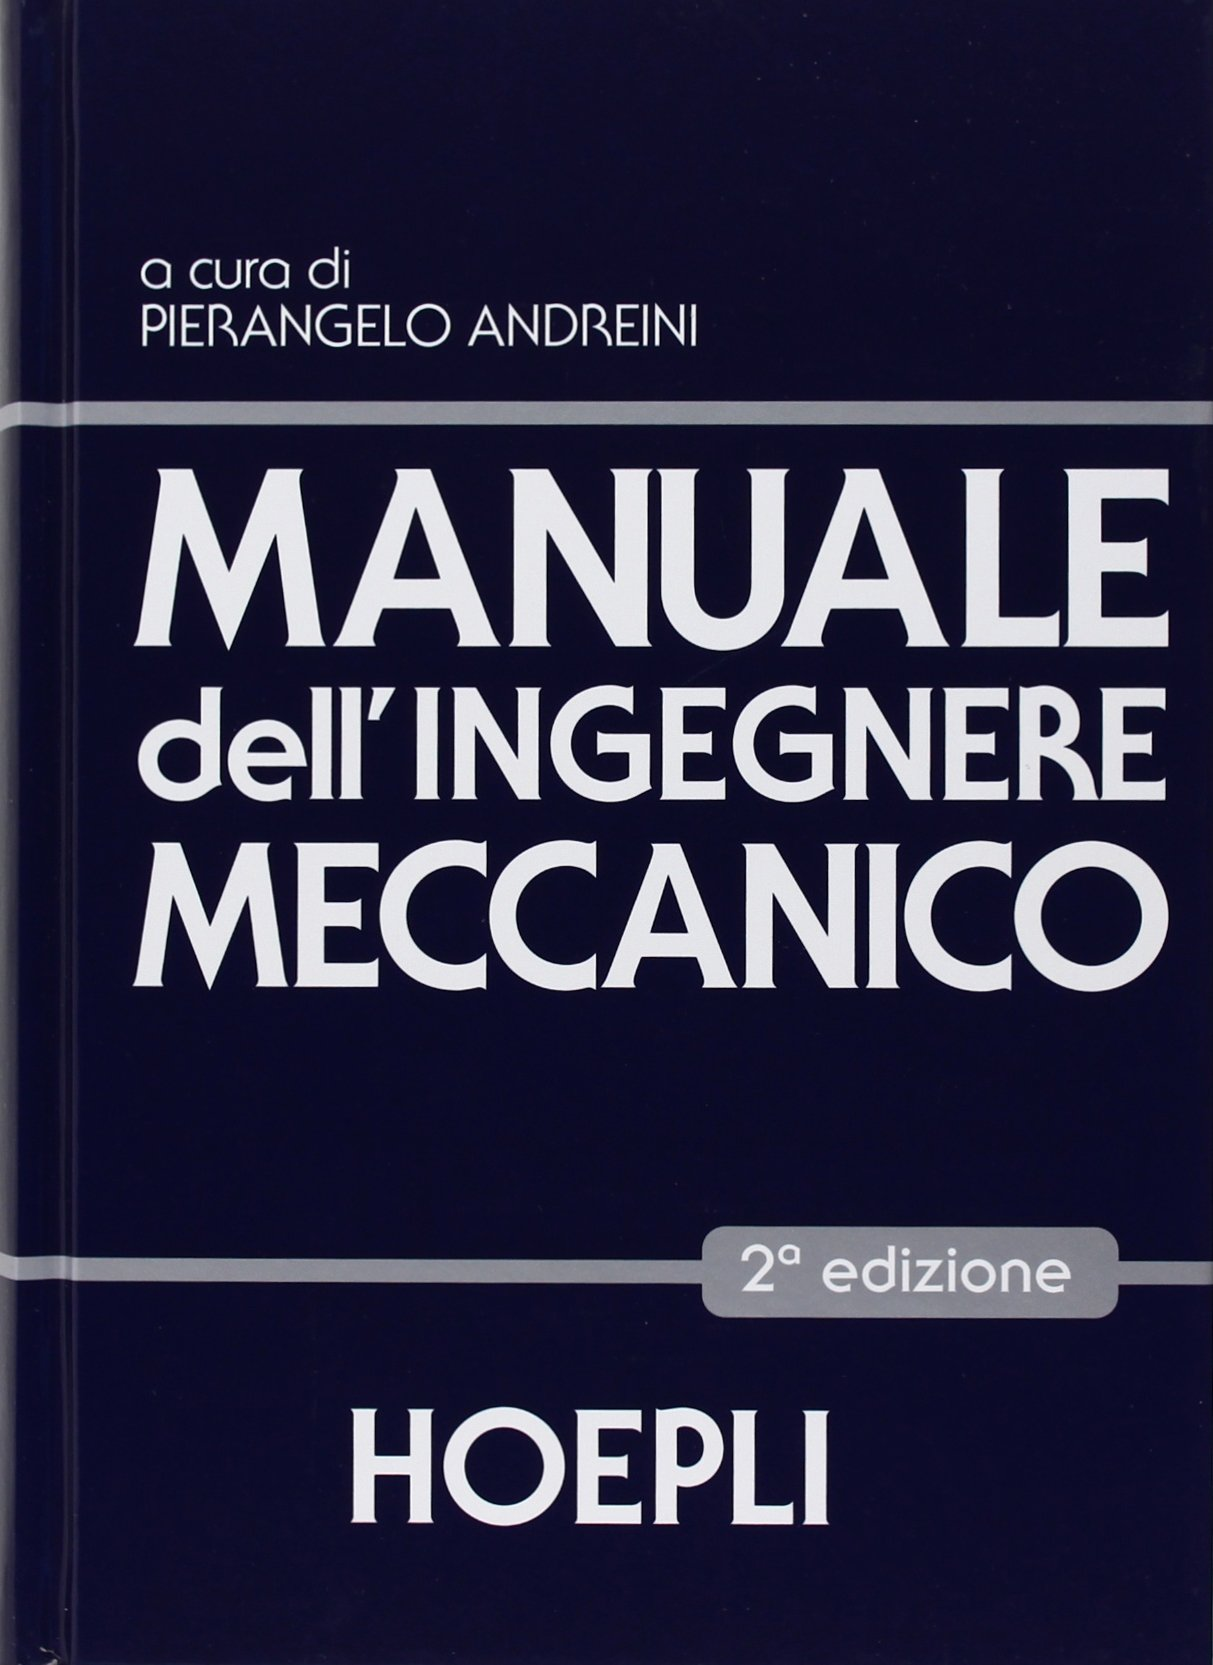 Manuale dellingegnere meccanico (Italian) Hardcover – January 1, 2005